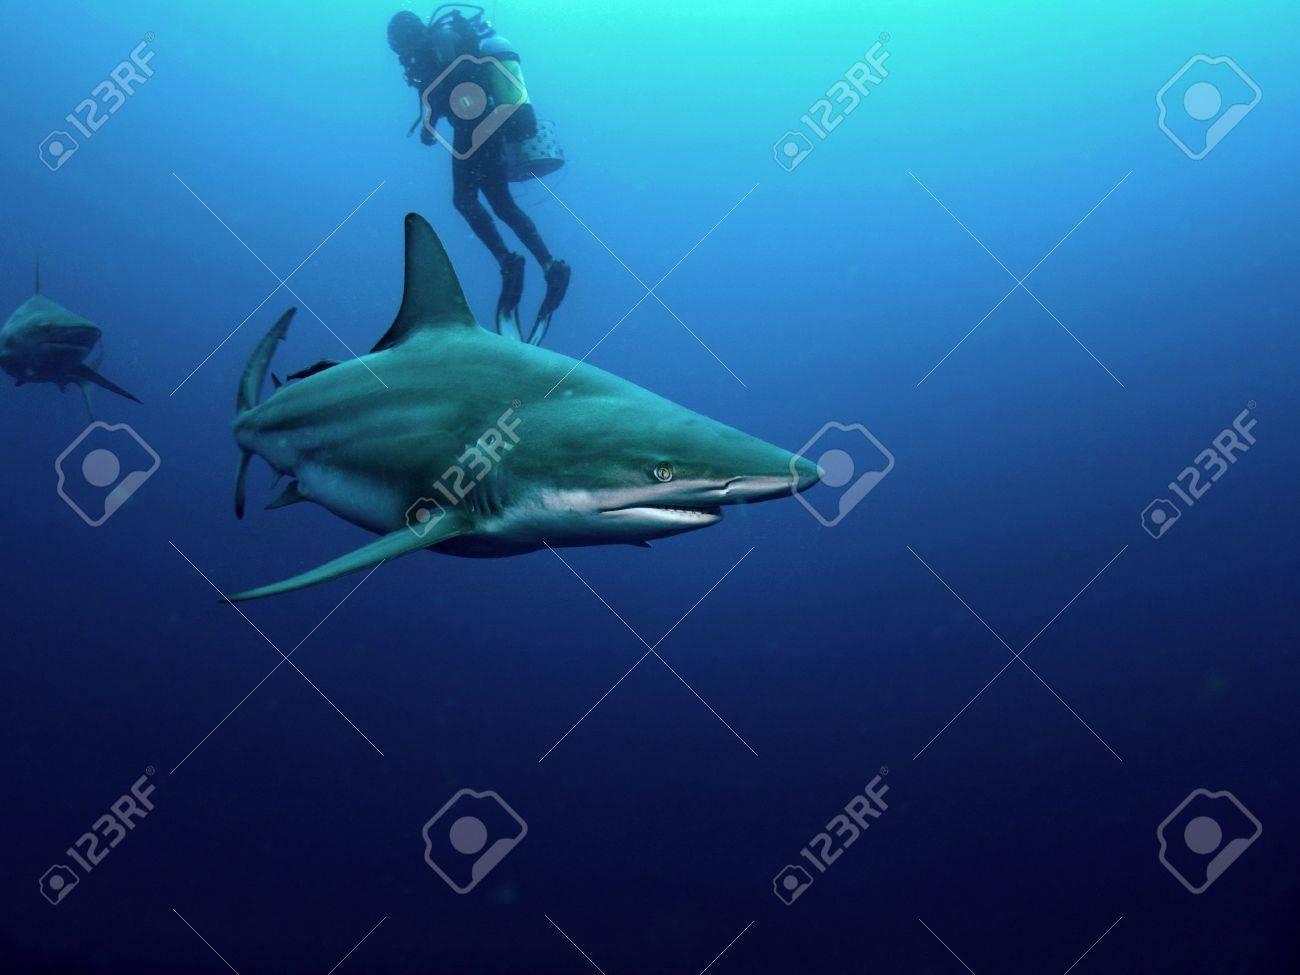 Blacktip (Carcharhinus limbatus) and Bull shark (Carcharhinus leucas) circling a scuba diver - 11205837